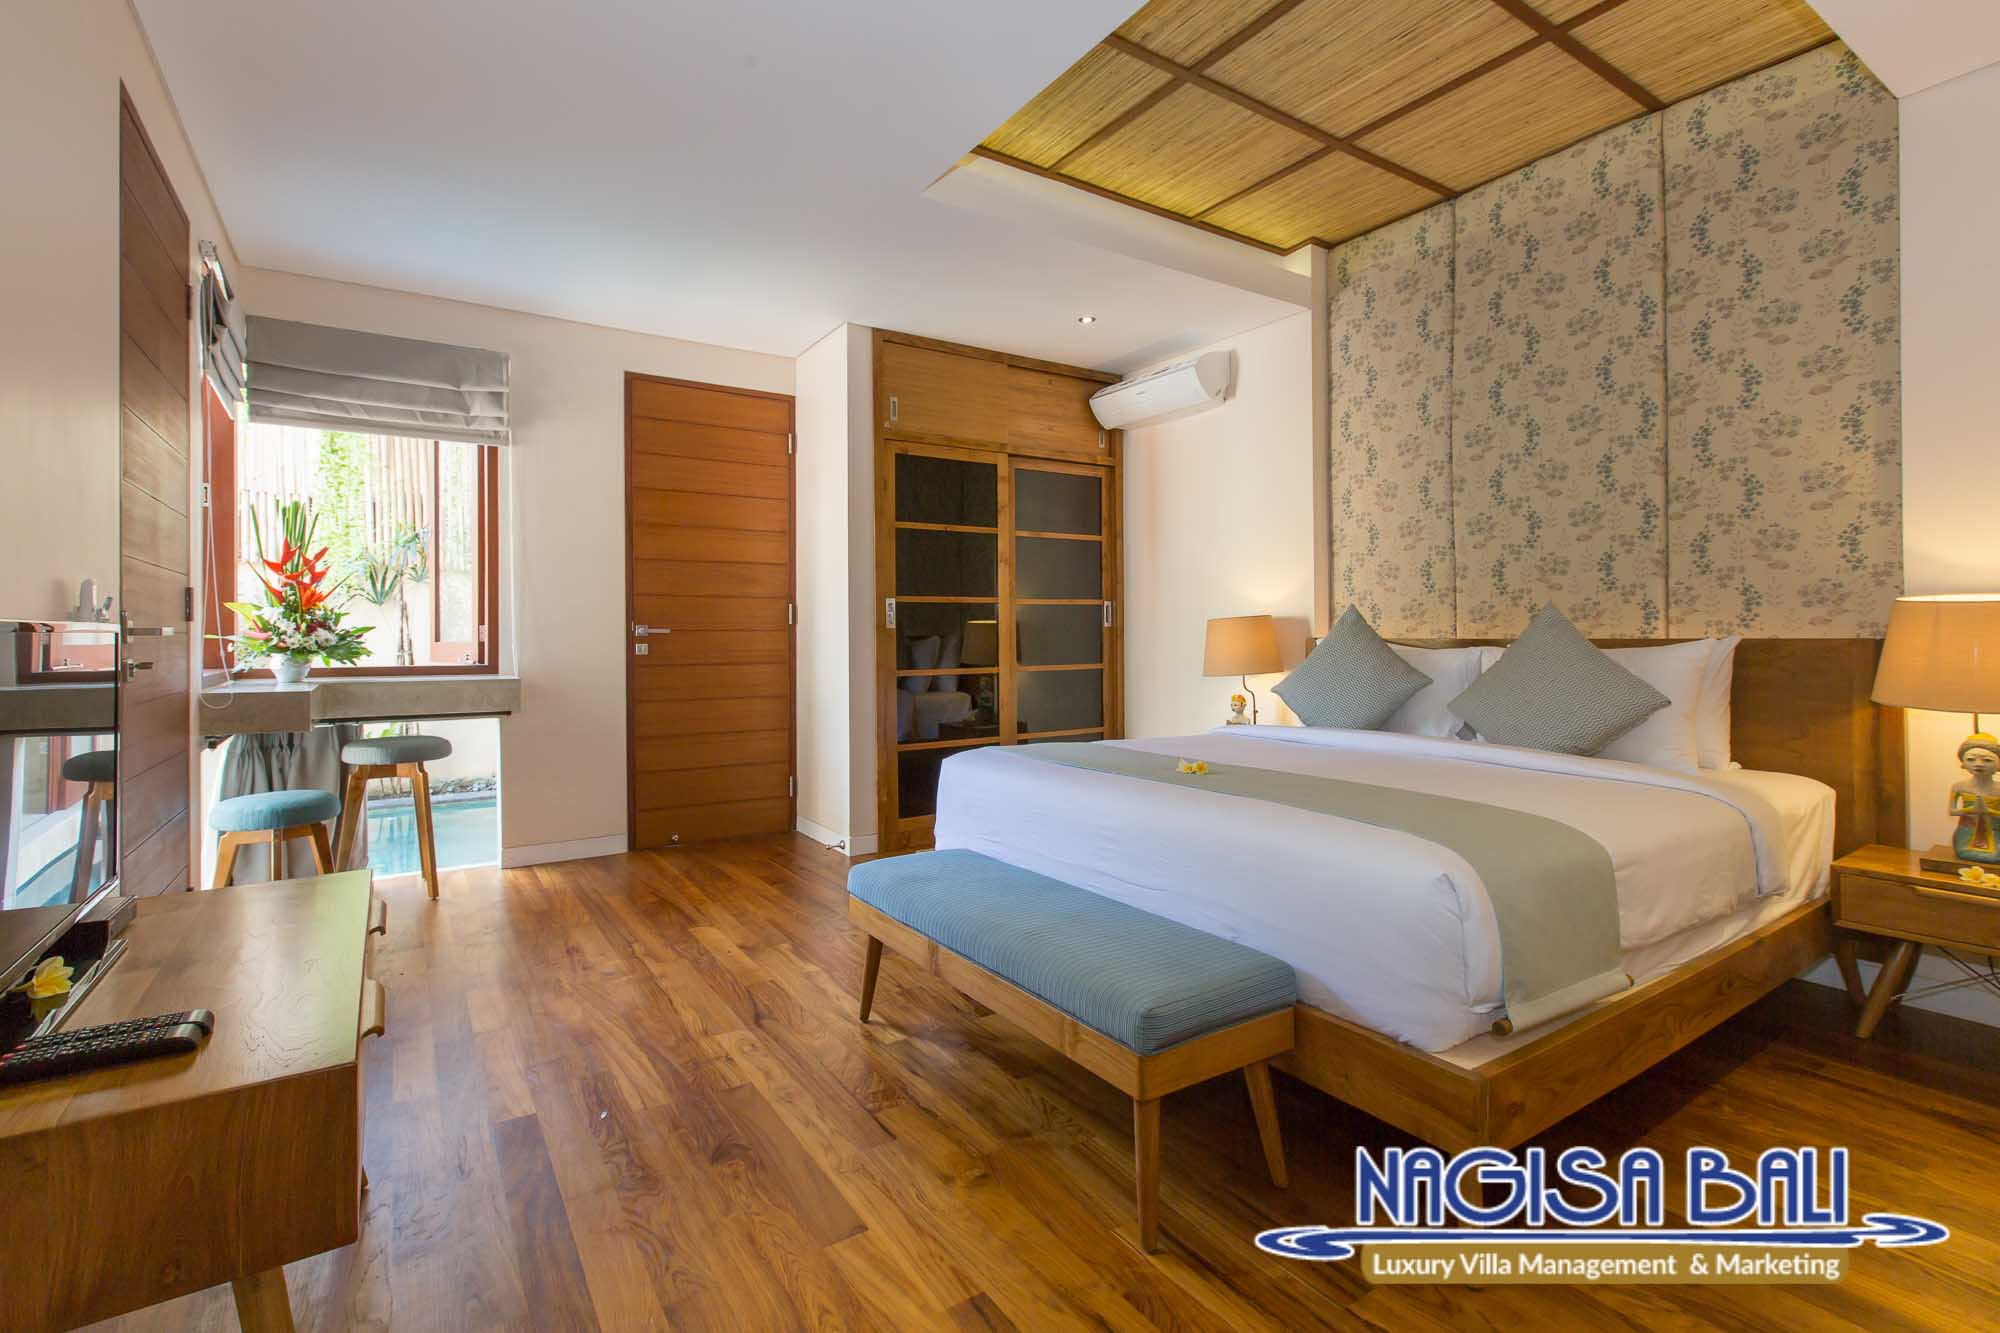 BBVillas 2 Bed-Bedroom 1-1217-Managed-by-Nagisa-Bali-194